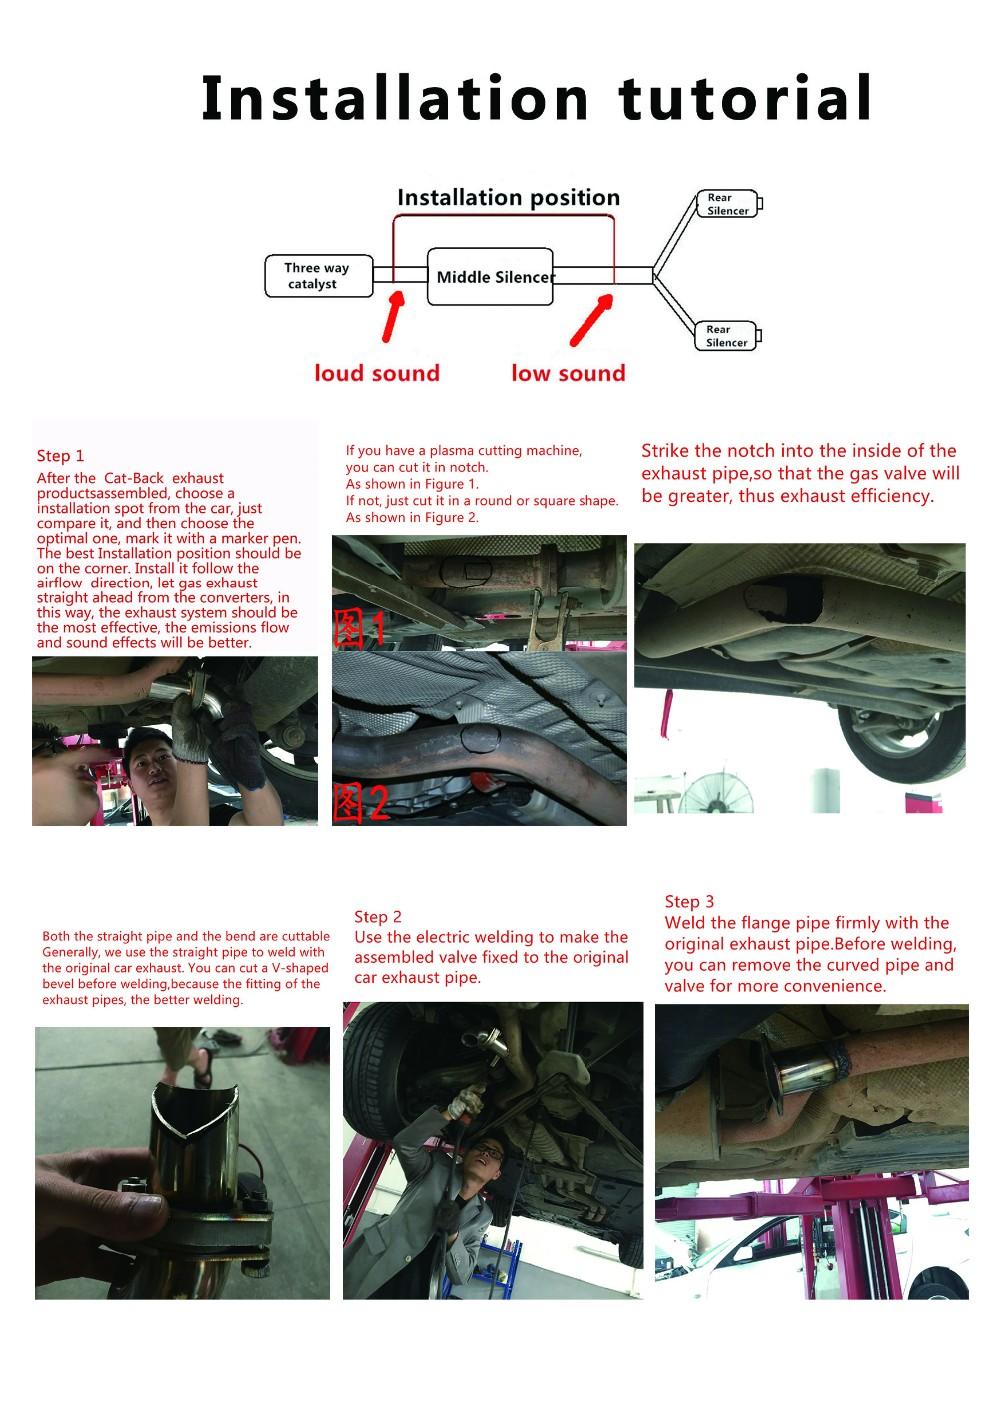 Exhaust Control Valve With Vacuum Actuator Cutout 3